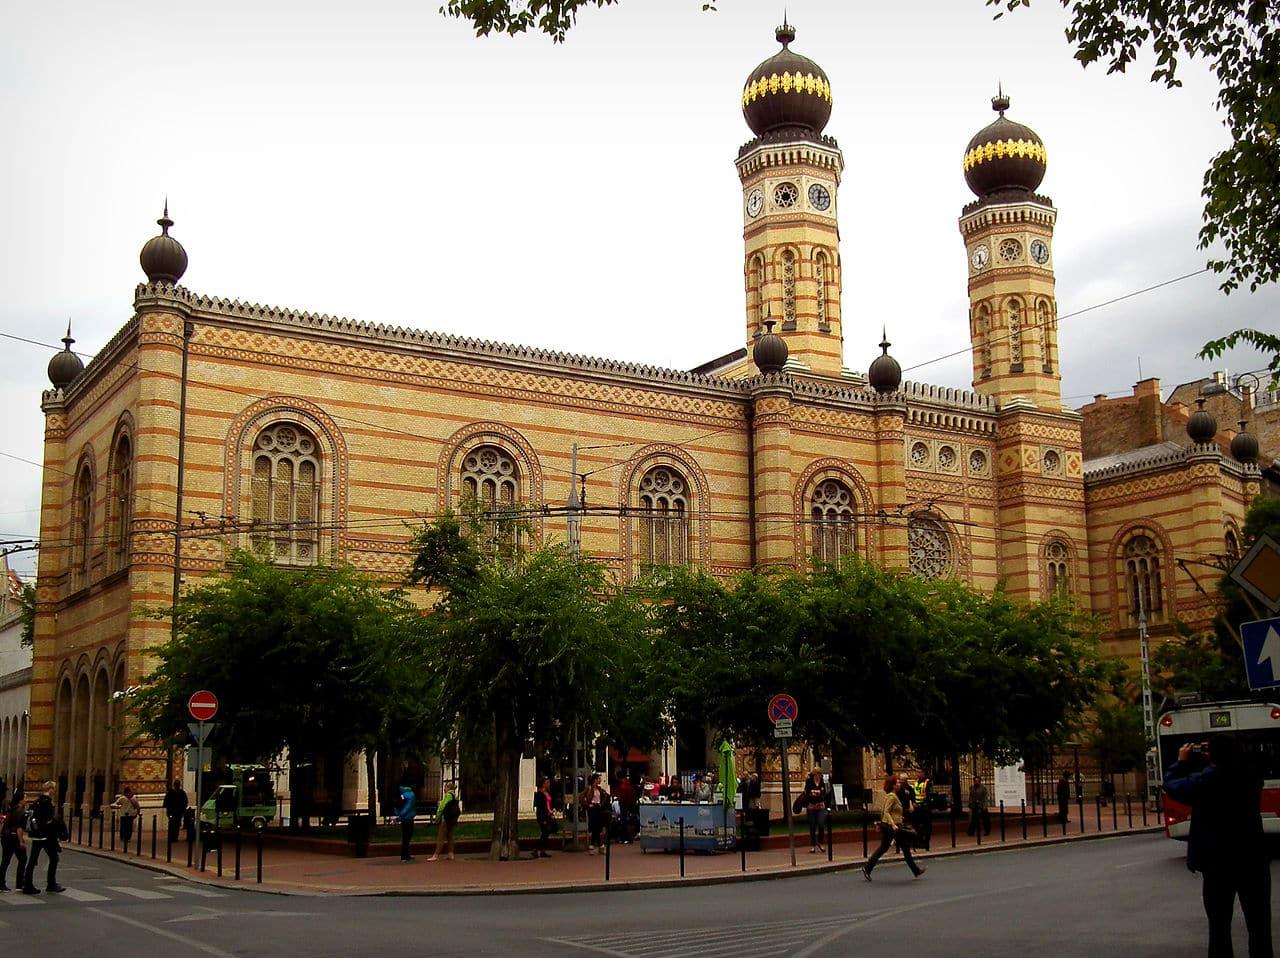 synagogue, Hungary, Budapest